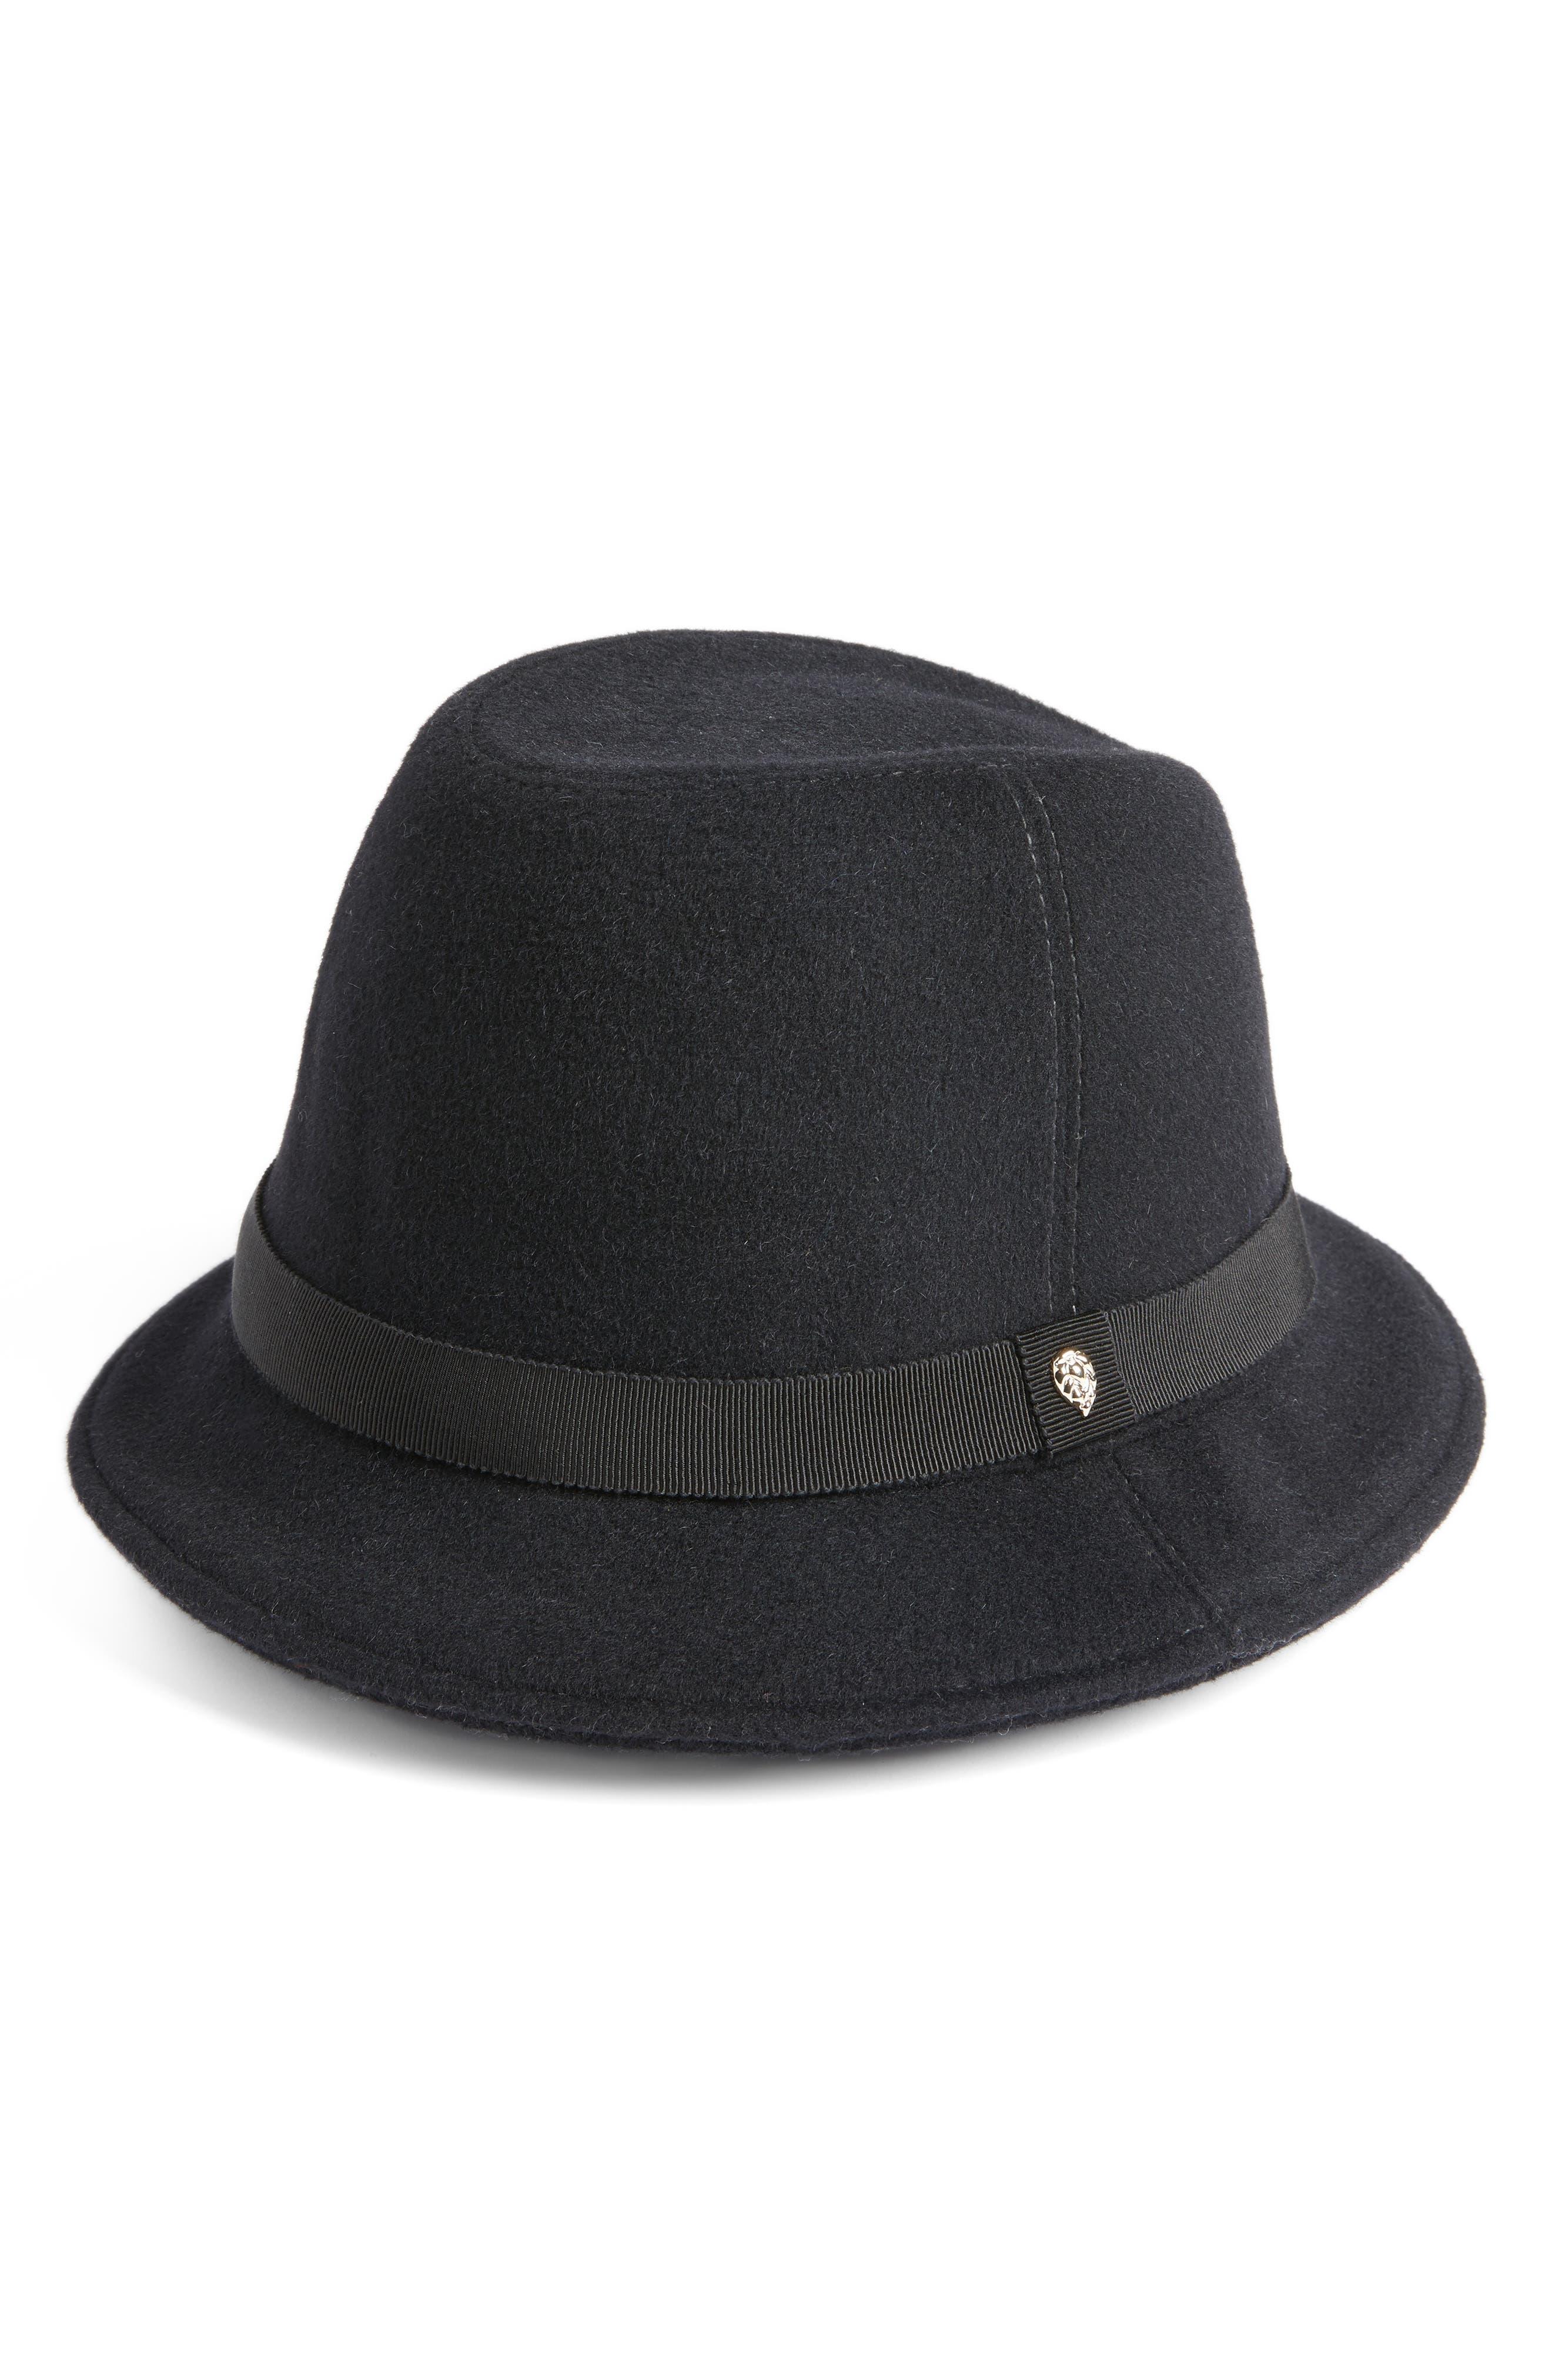 Main Image - Helen Kaminski Luxe Tapered Cloche Hat